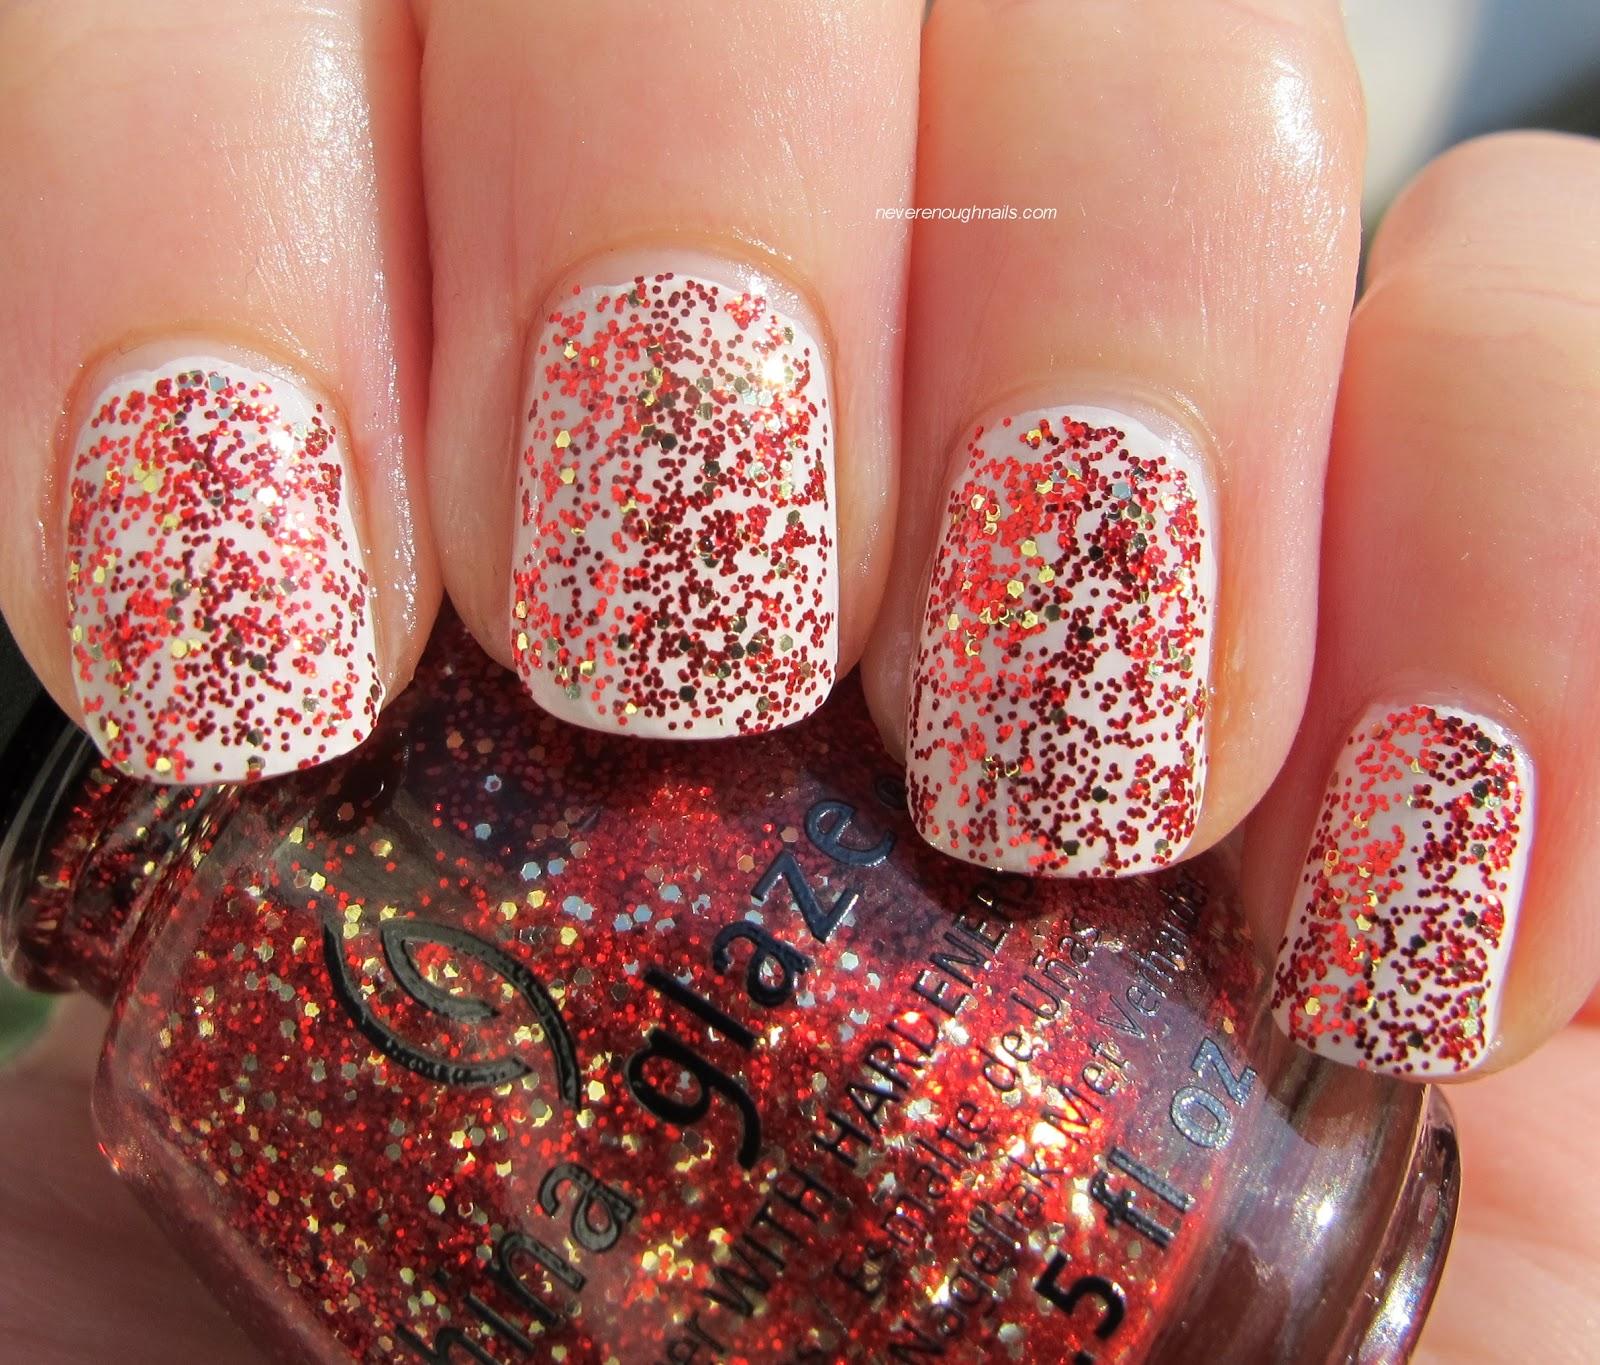 Never Enough Nails: China Glaze Pure Joy